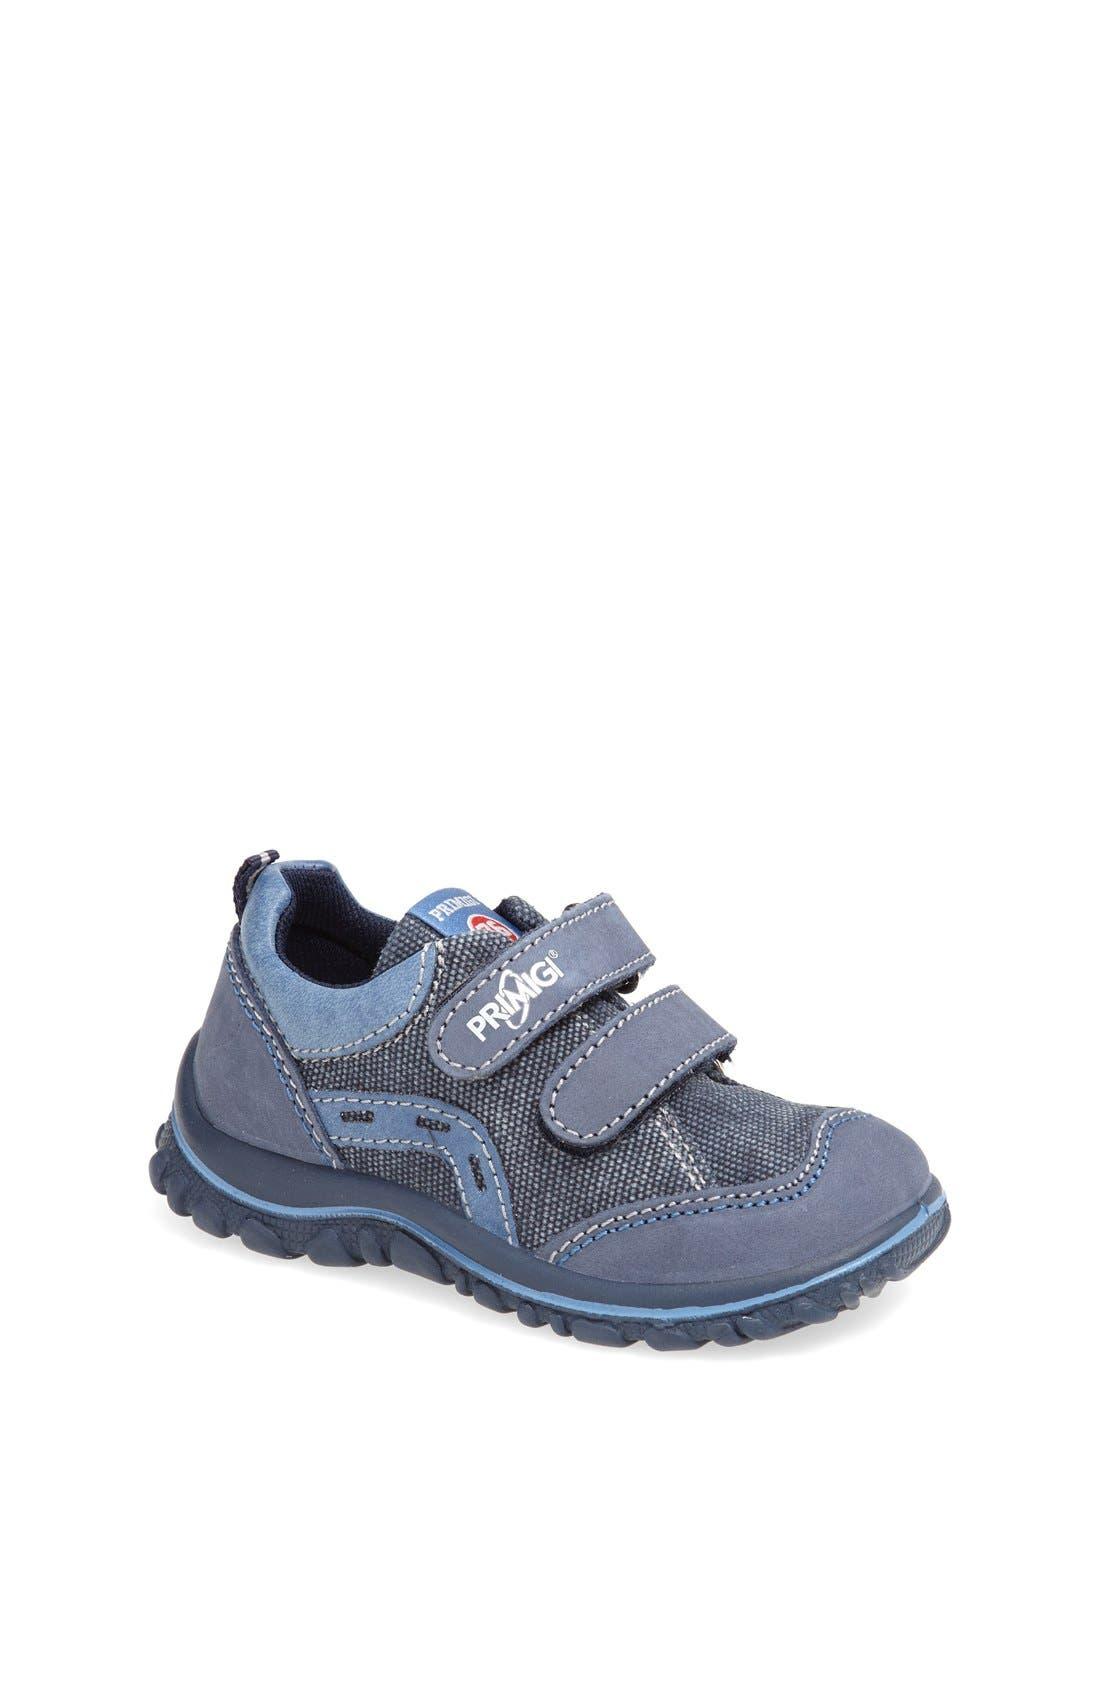 Main Image - Primigi 'Biby' Sneaker (Walker, Toddler & Little Kid)